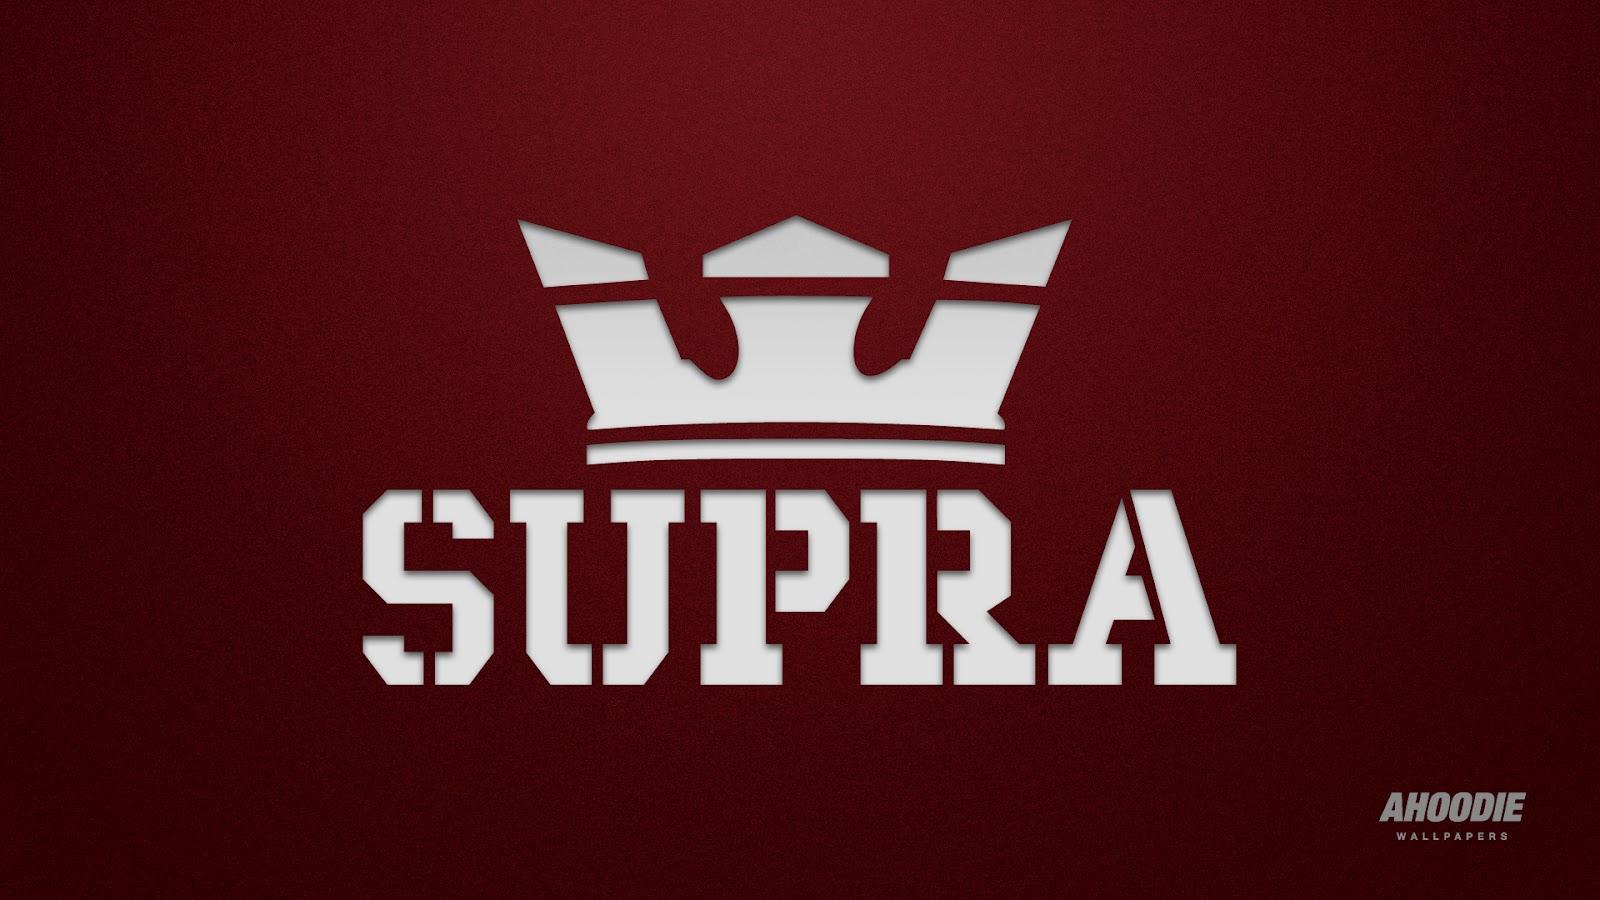 Supra Shoes Logo Wallpaper for Pinterest 1600x900